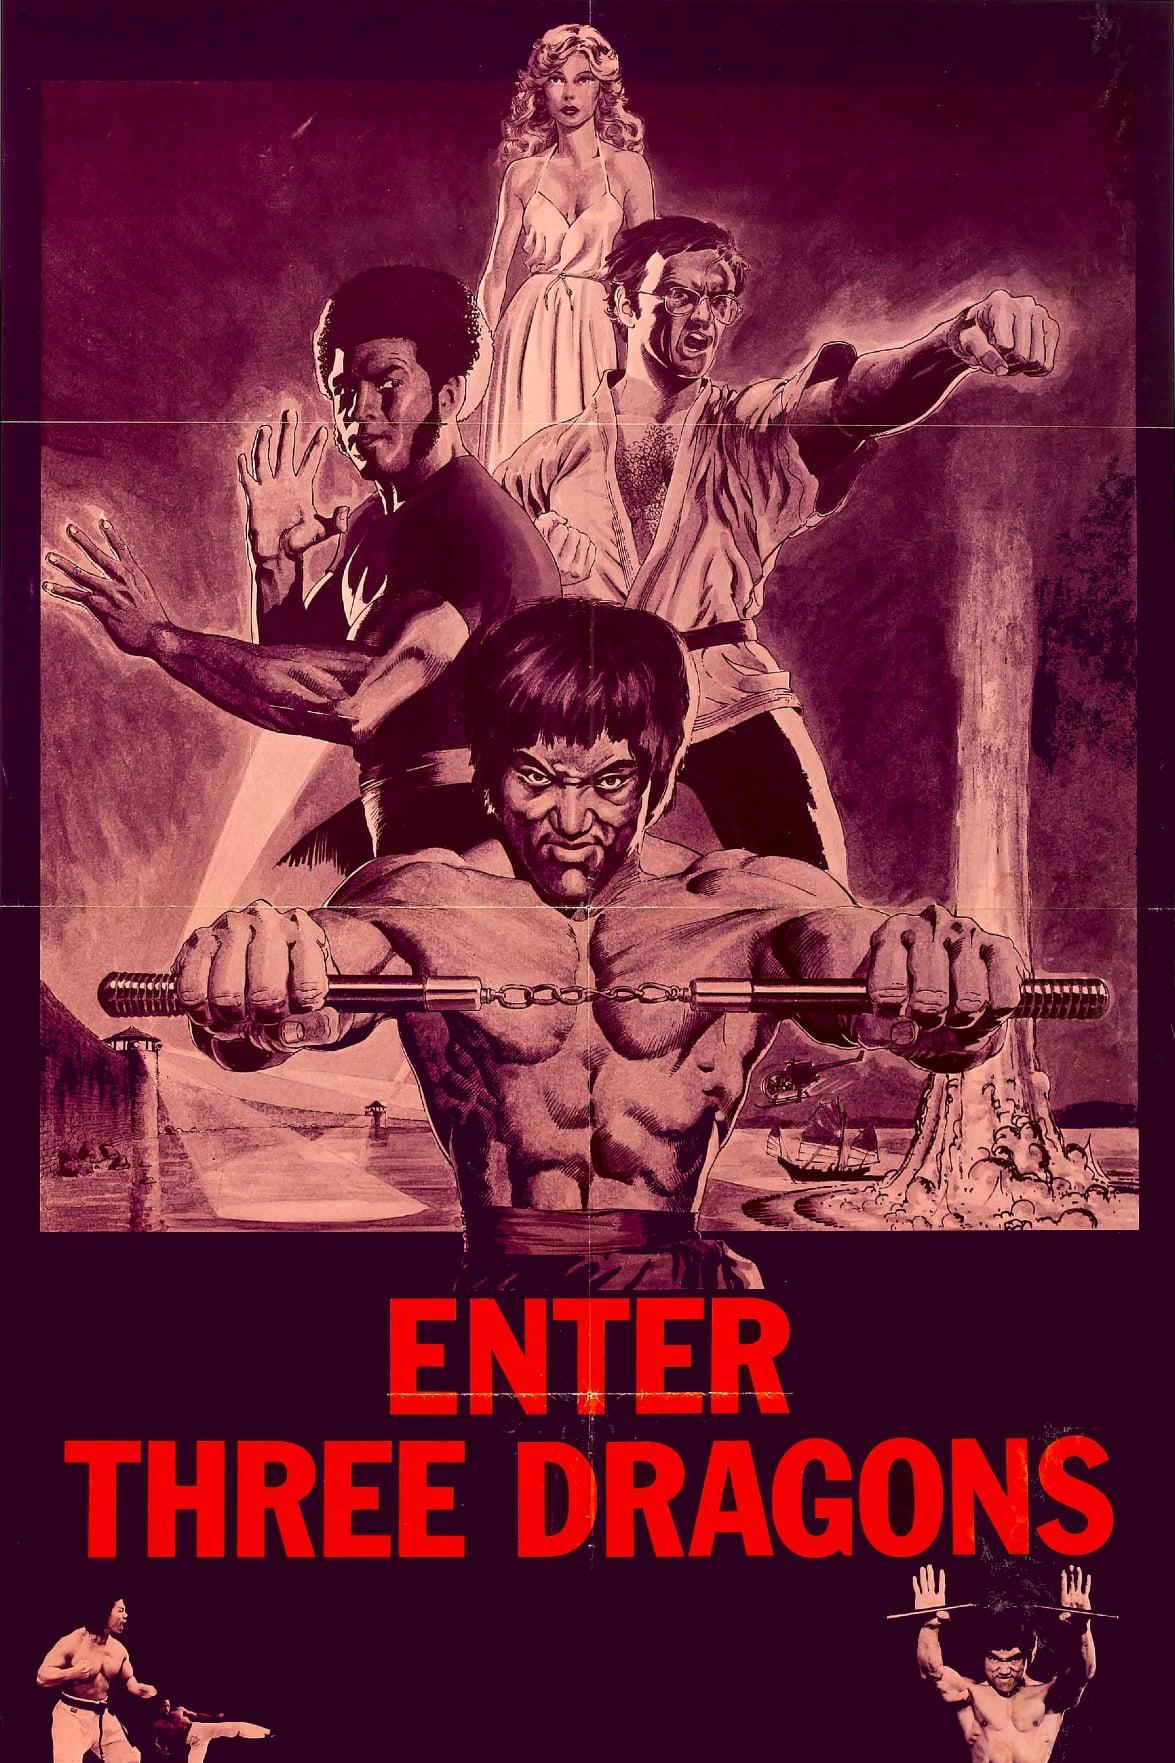 Enter Three Dragons